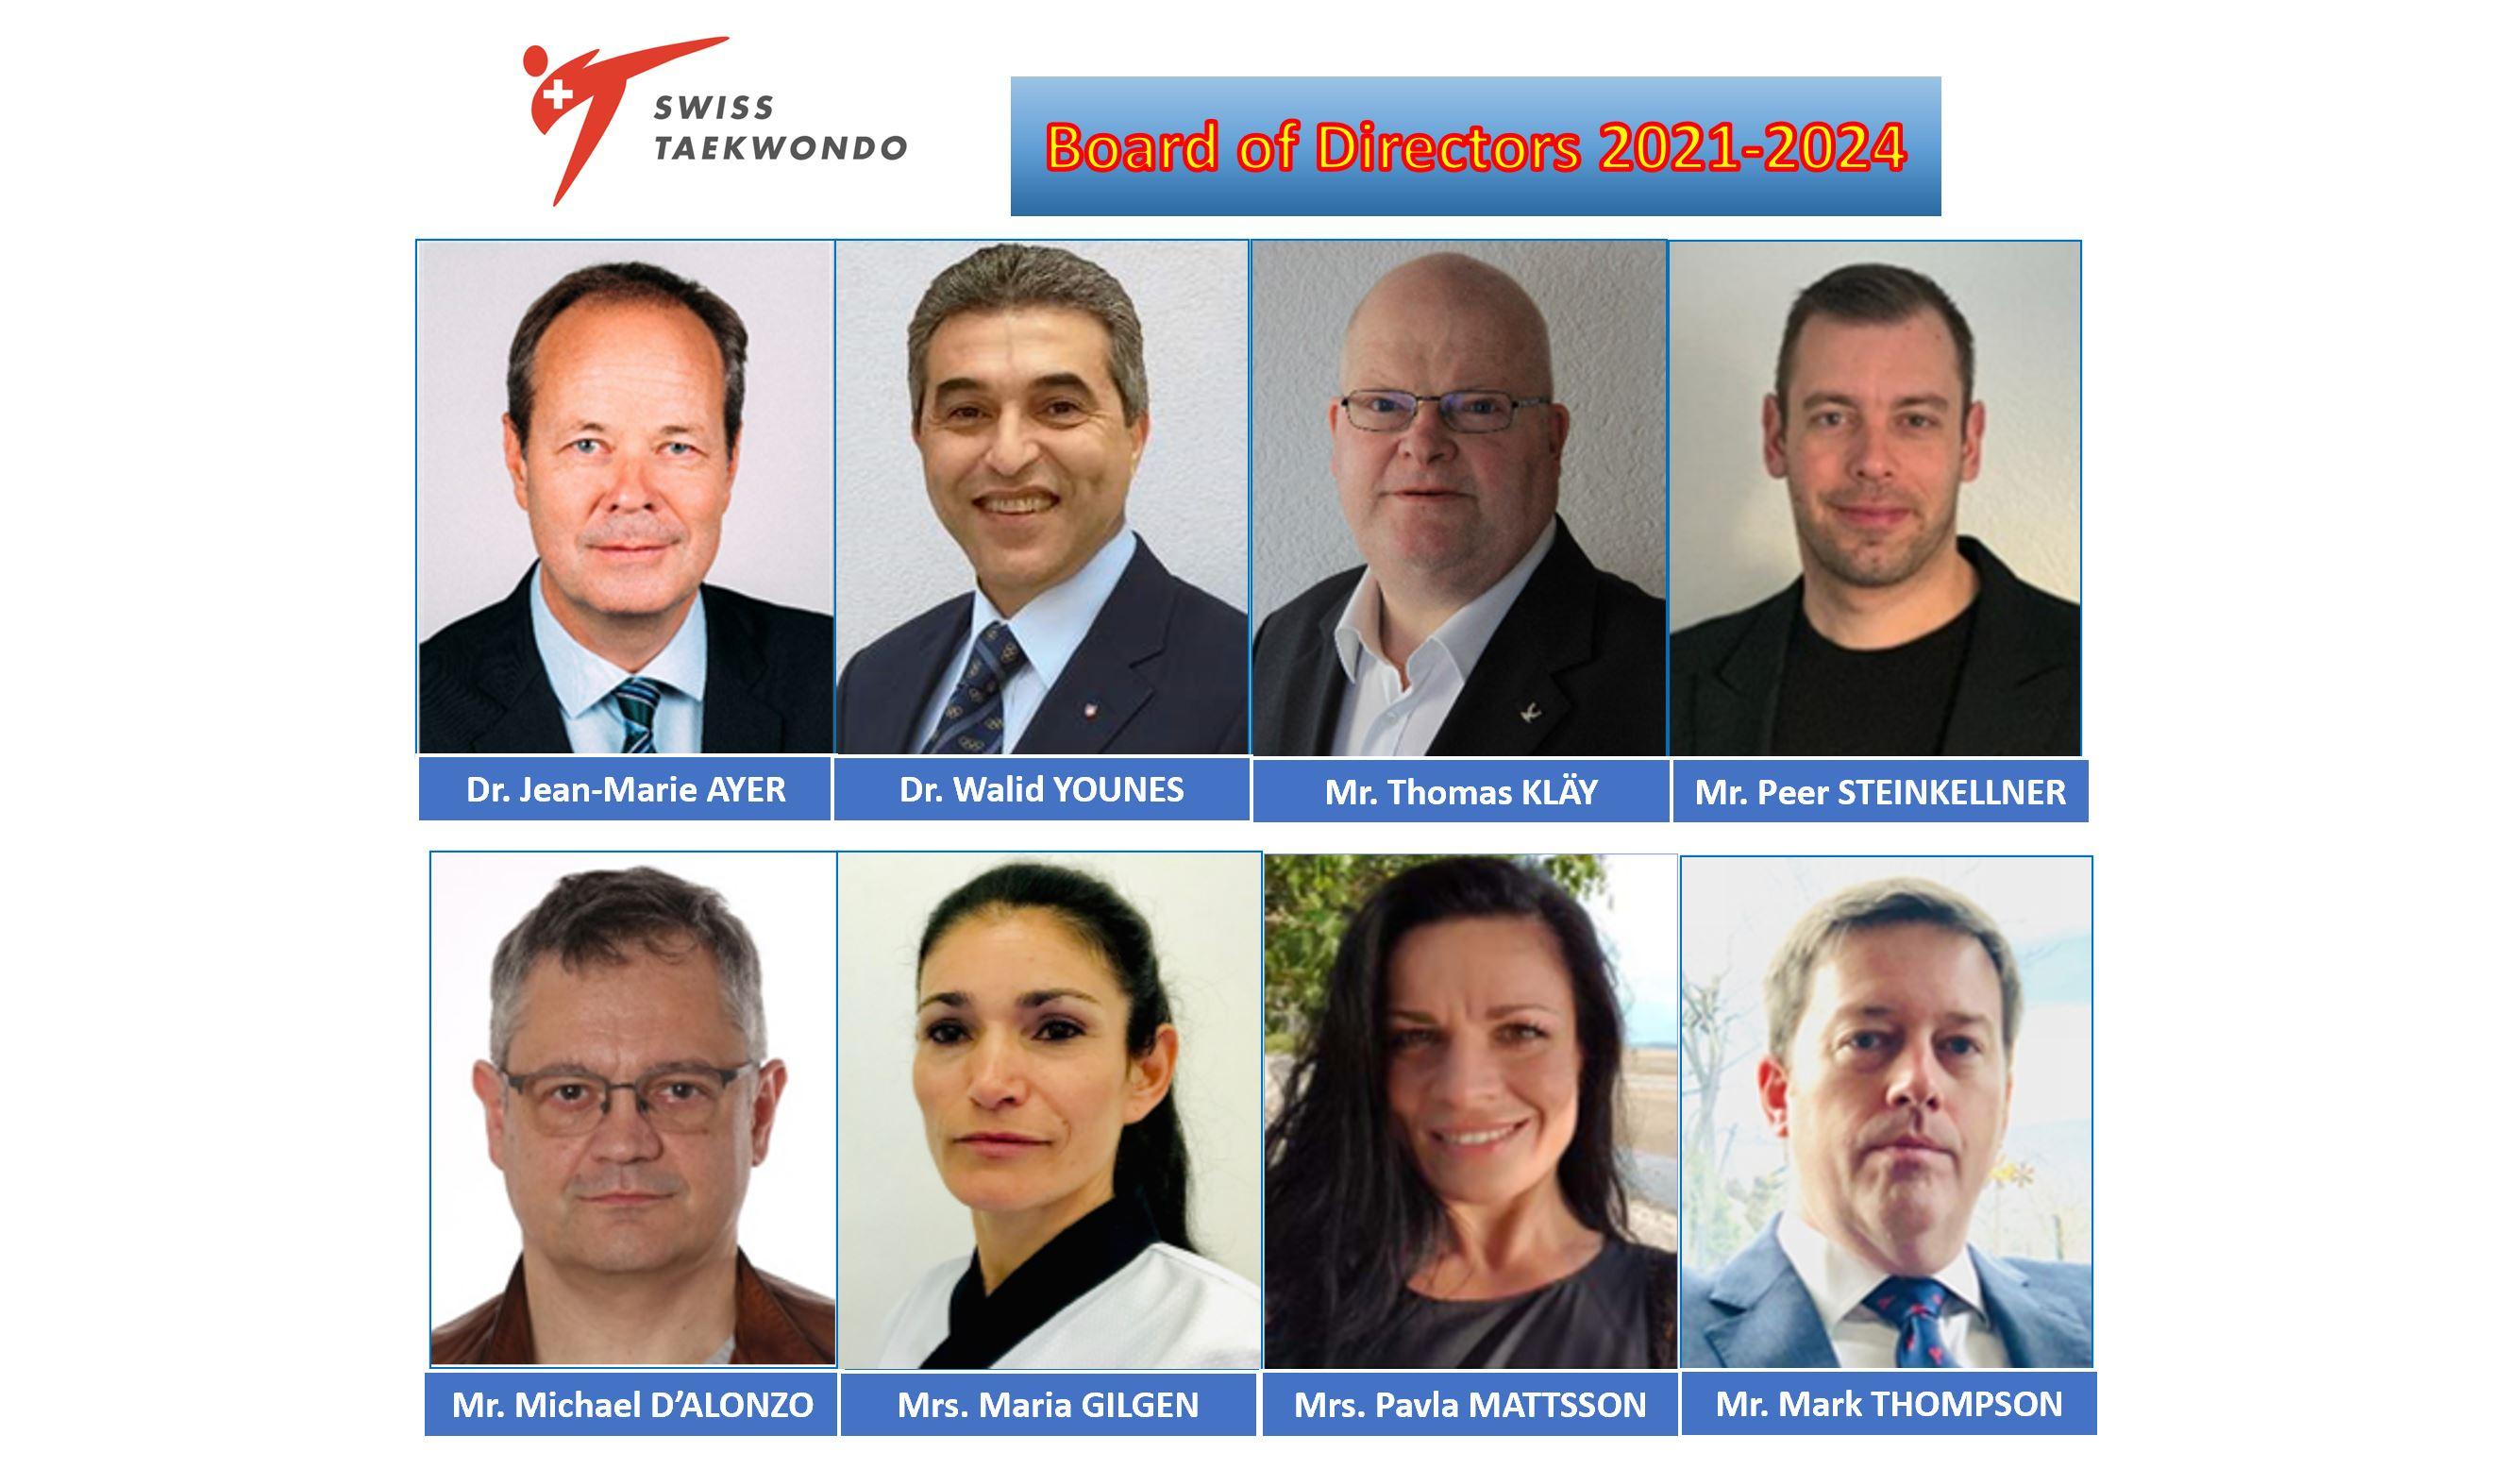 Elelected Swiss Taekwondo Board of Directors – 03 July 2021